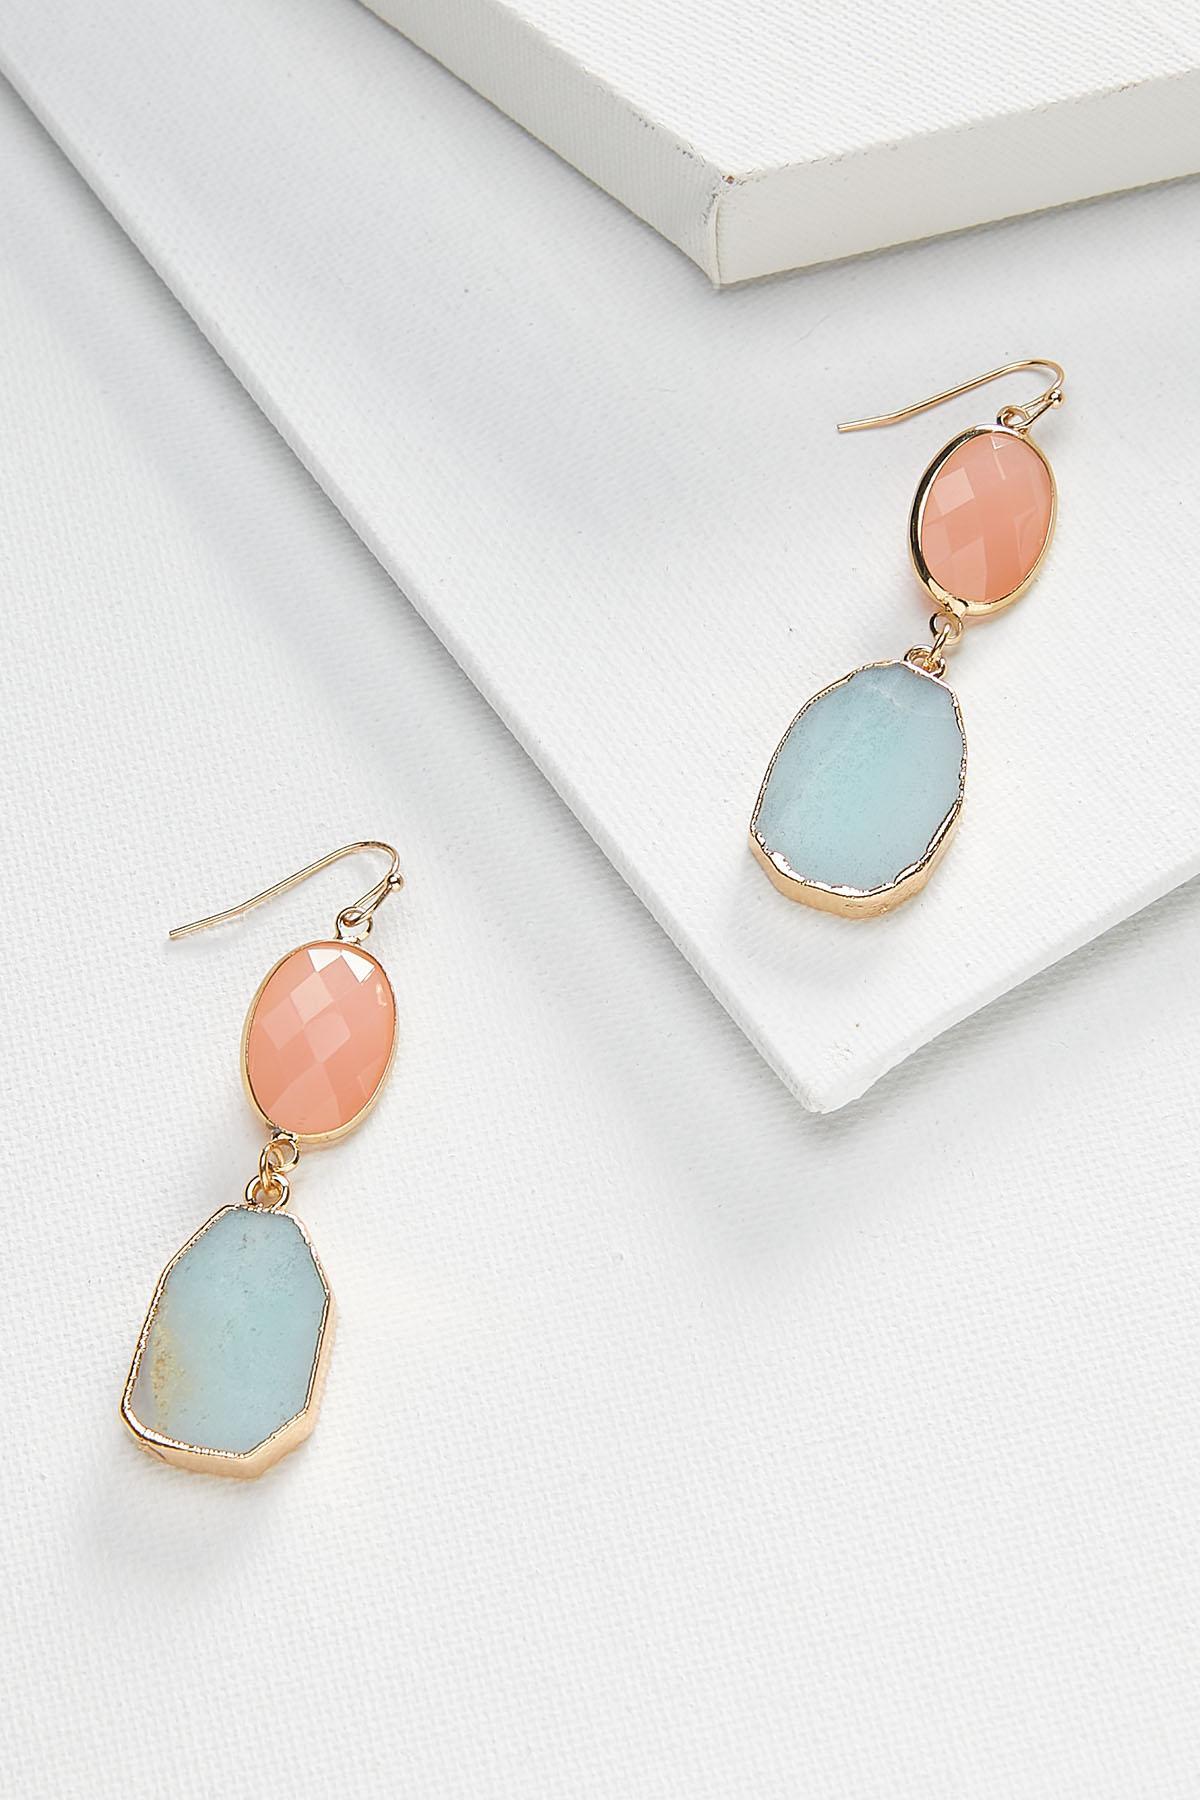 Darling Druzy Earrings